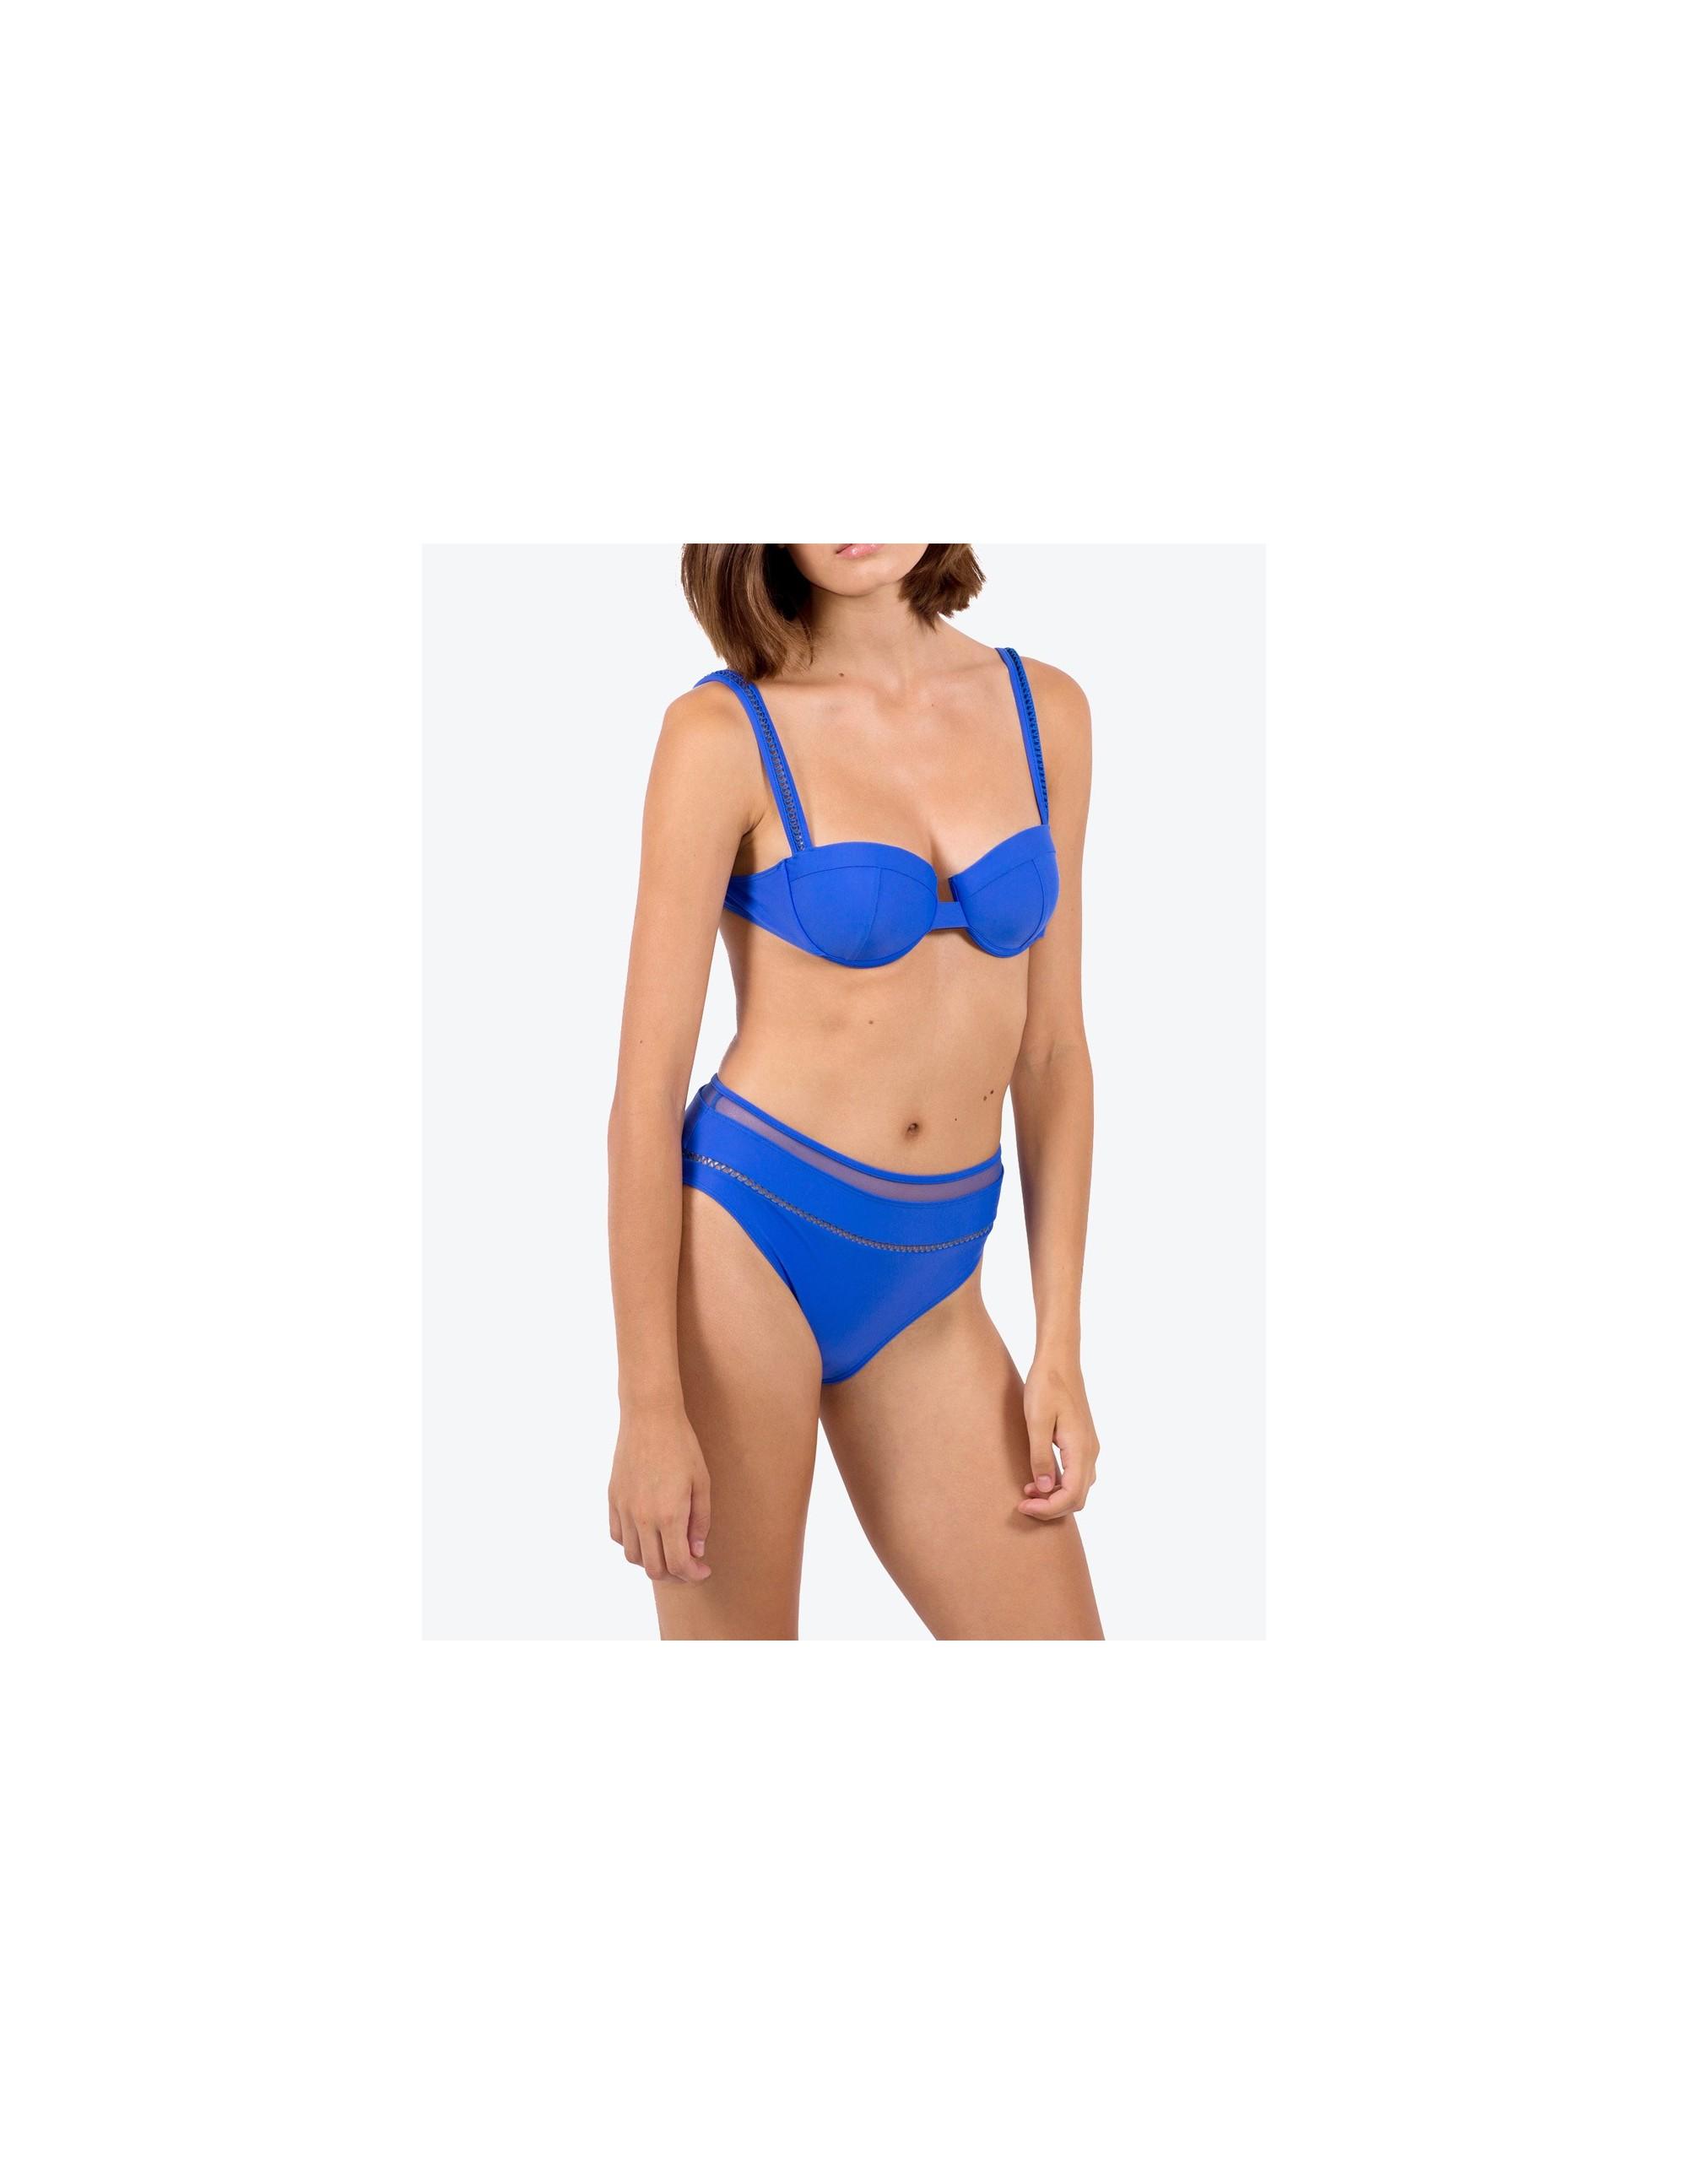 SIMOS bikini bottom - ECHO BLUE